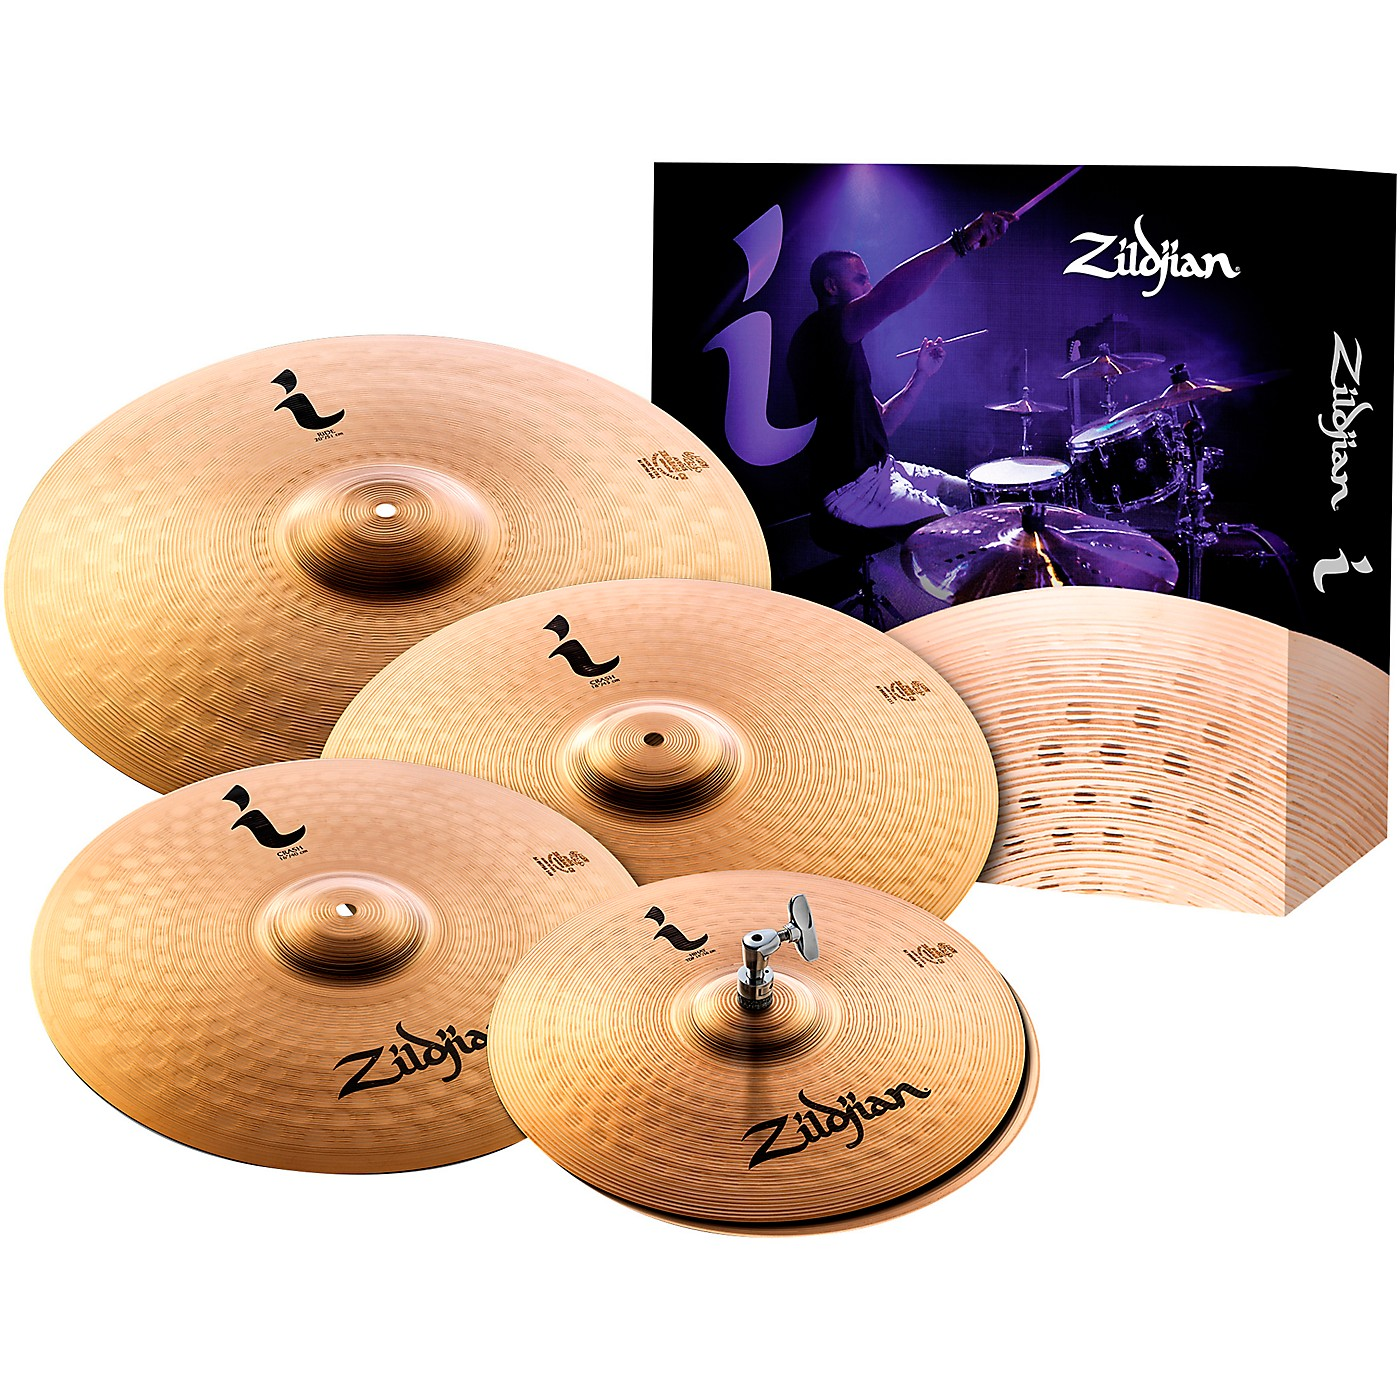 Zildjian I Series Pro Gig Cymbal Pack thumbnail